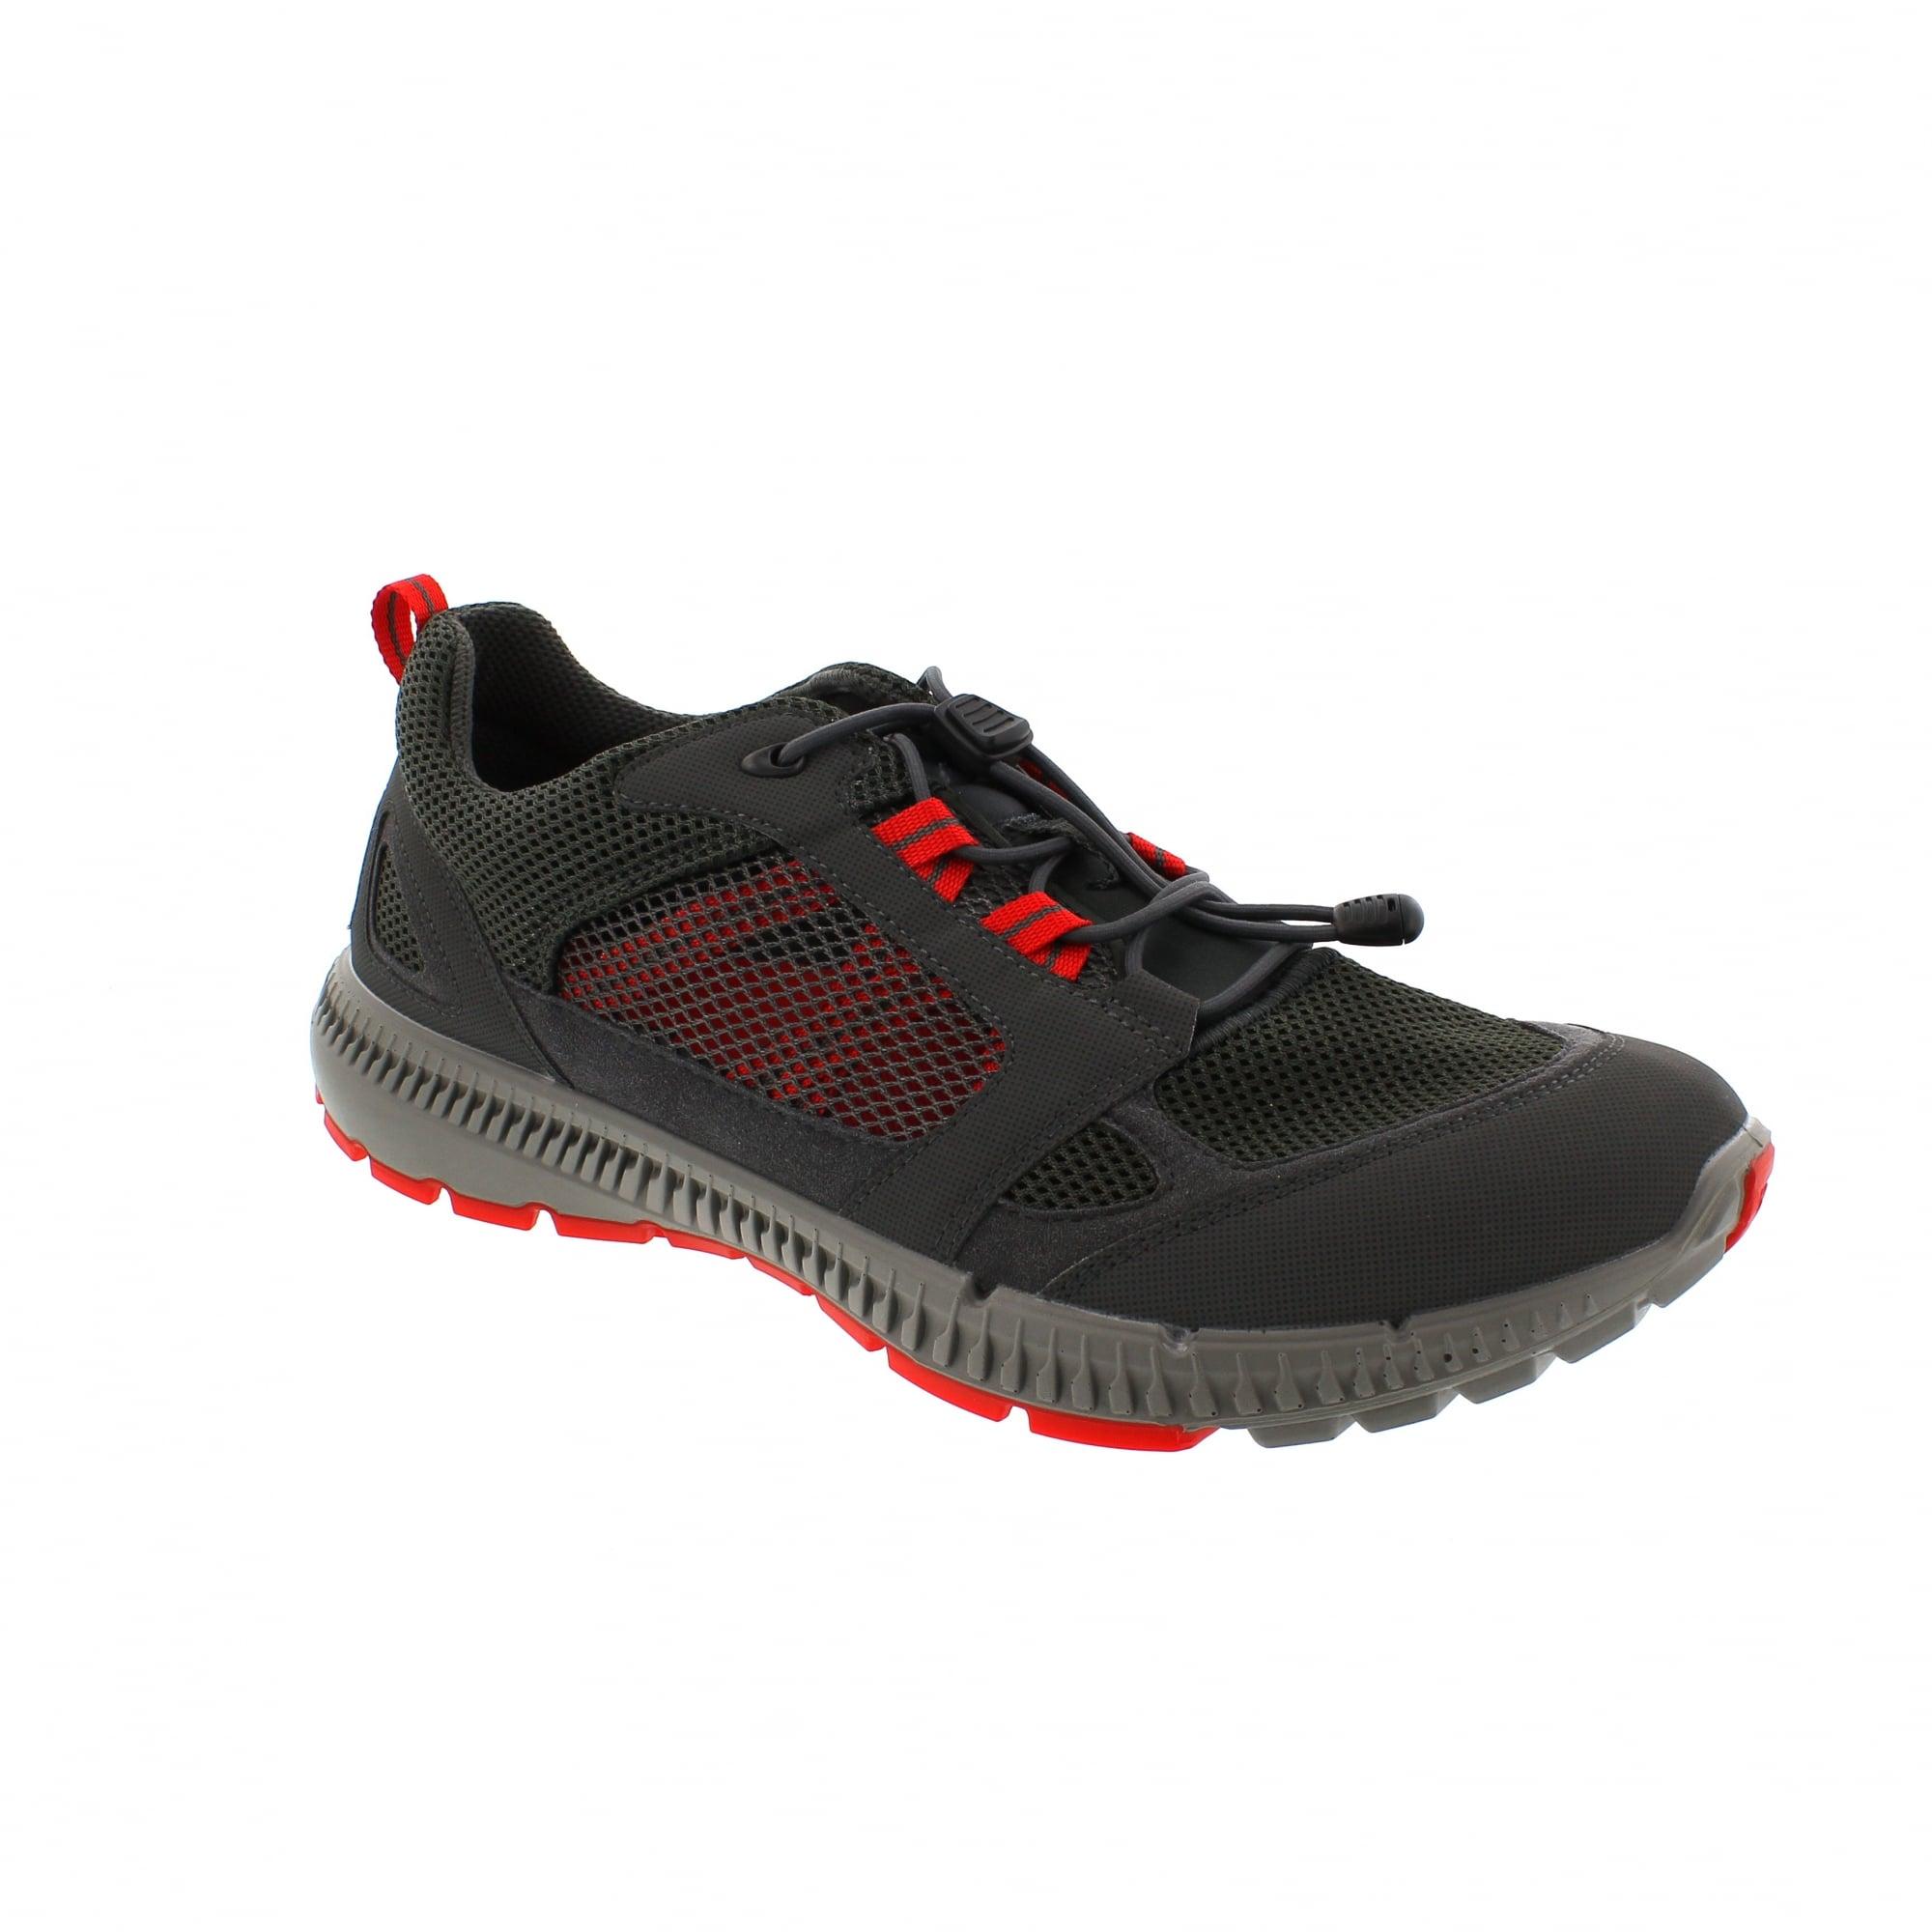 feinste Stoffe am besten einkaufen Preis bleibt stabil Ecco Terracruise II | 843014-56586 - Mens from Rogerson Shoes UK